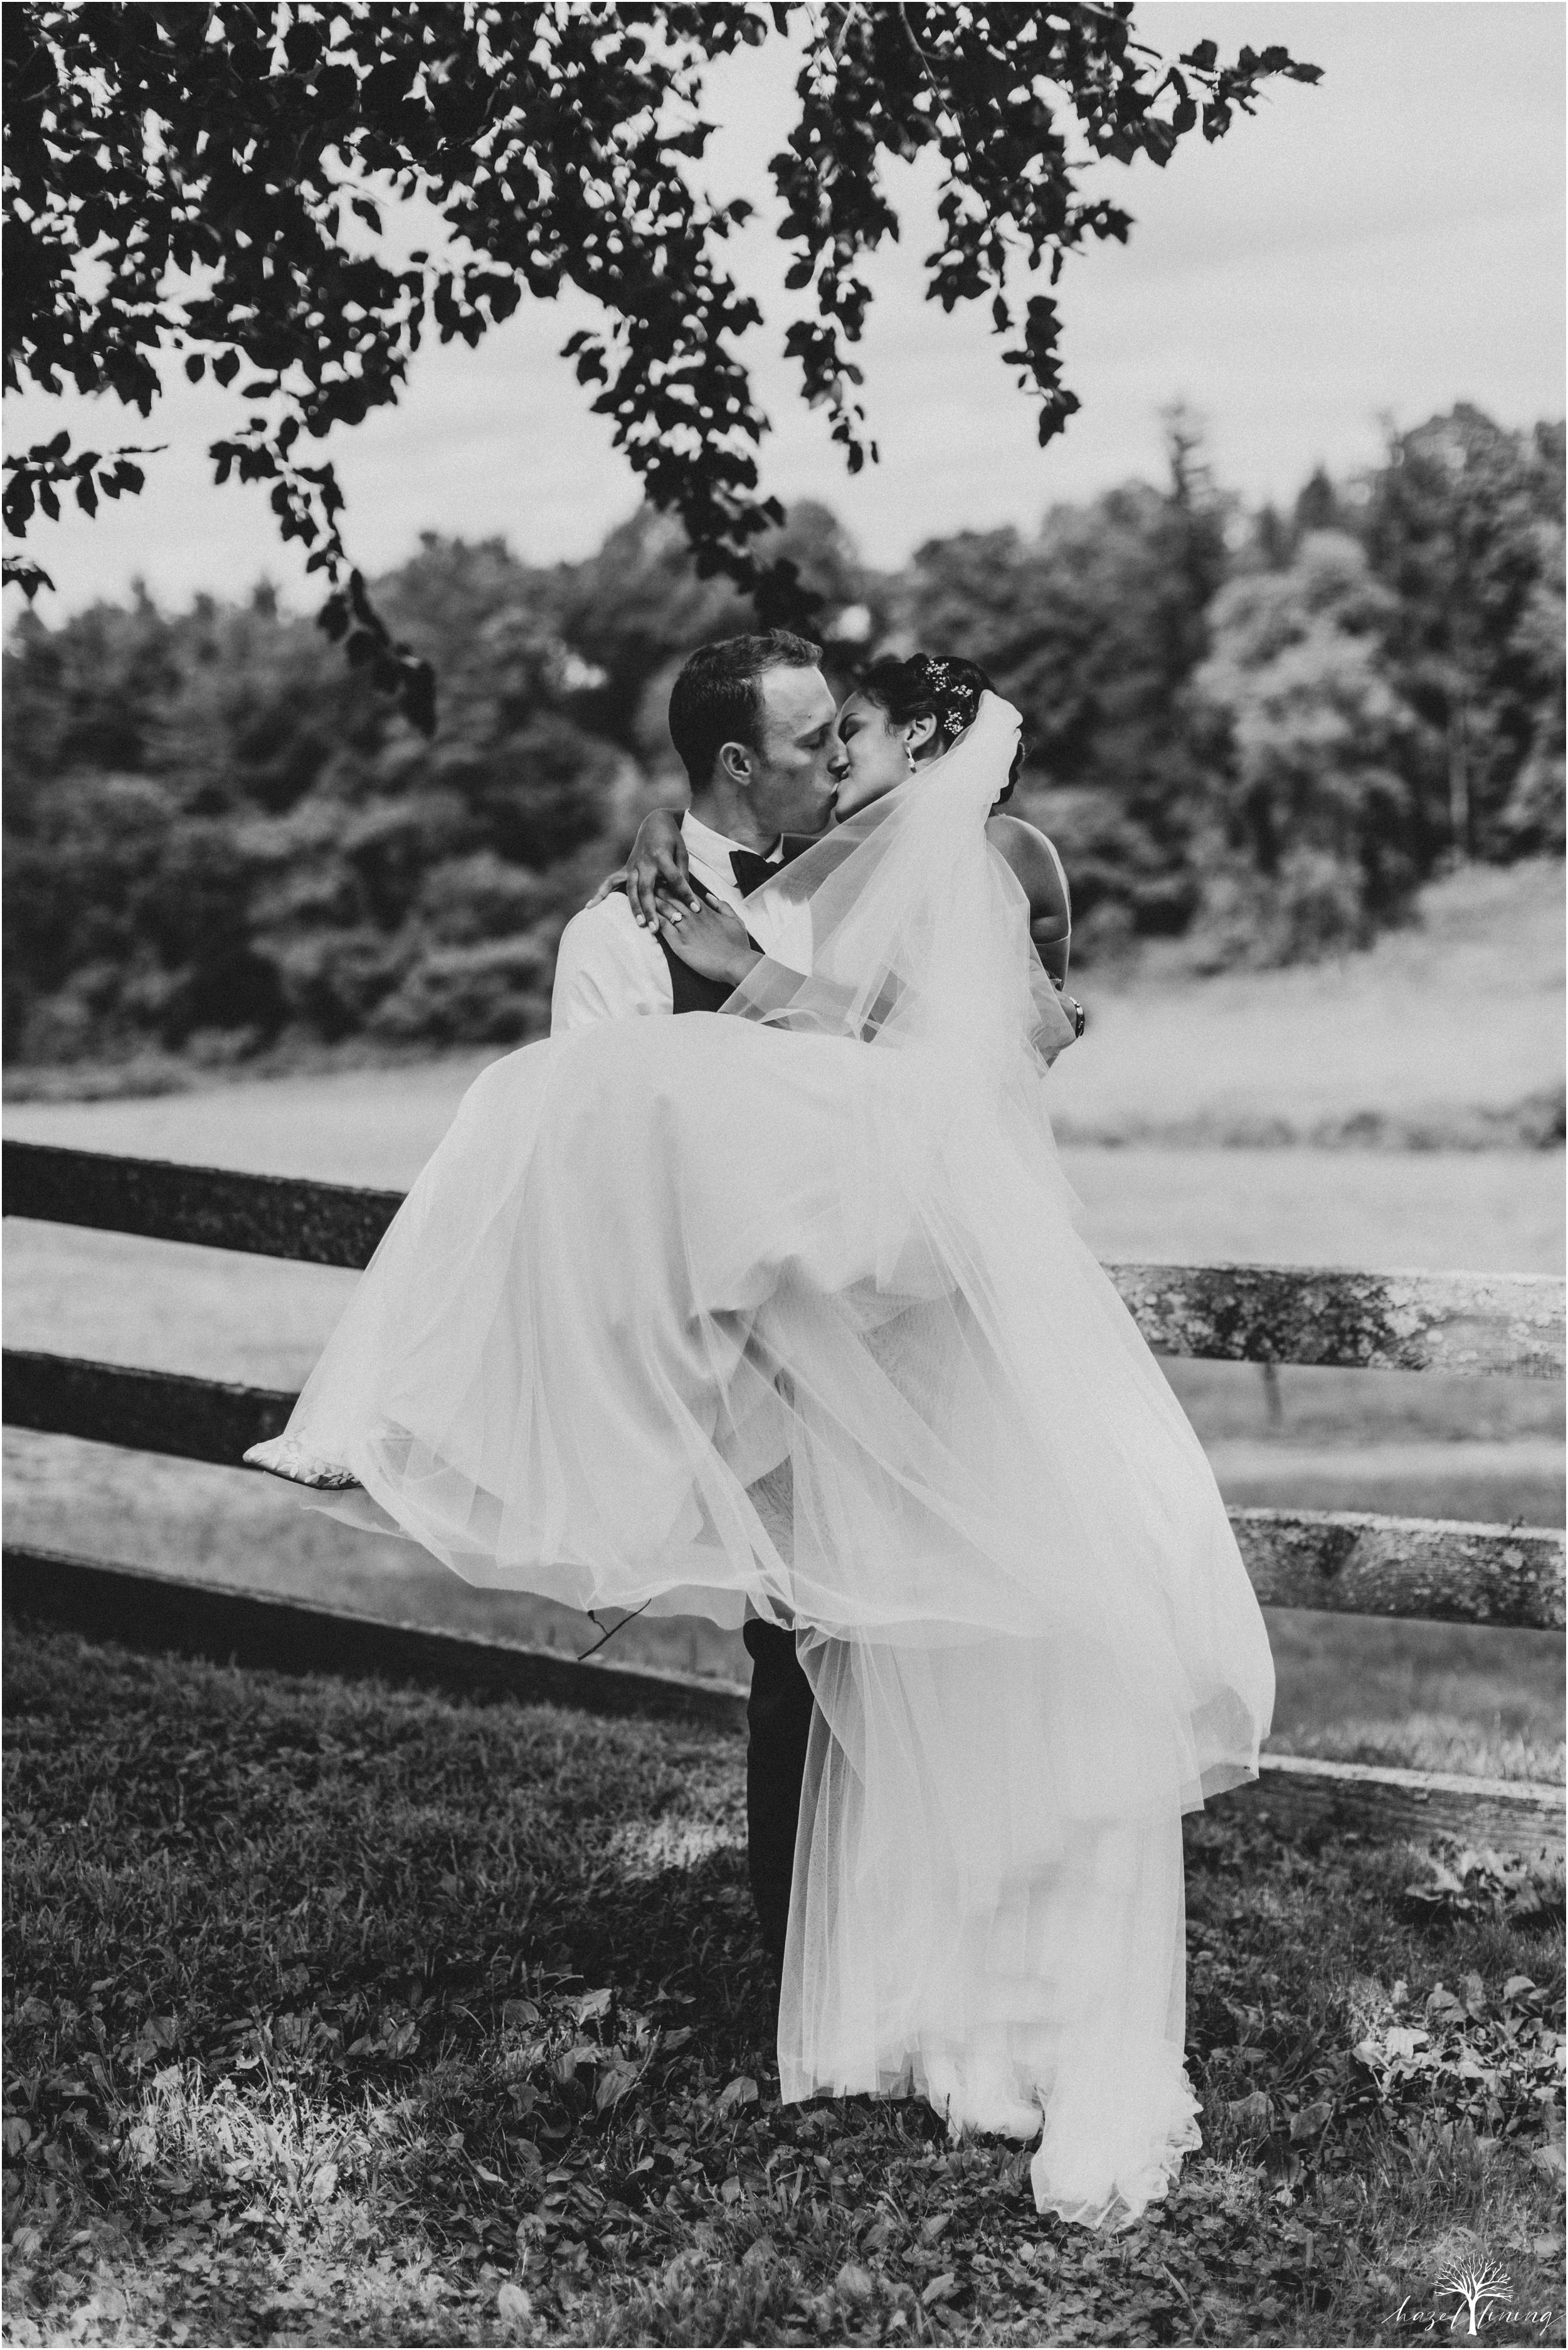 mariah-kreyling-samuel-sherratt-sherrattwiththeworld-peirce-farm-at-witch-hill-boston-massachusetts-wedding-photography-hazel-lining-travel-wedding-elopement-photography_0148.jpg